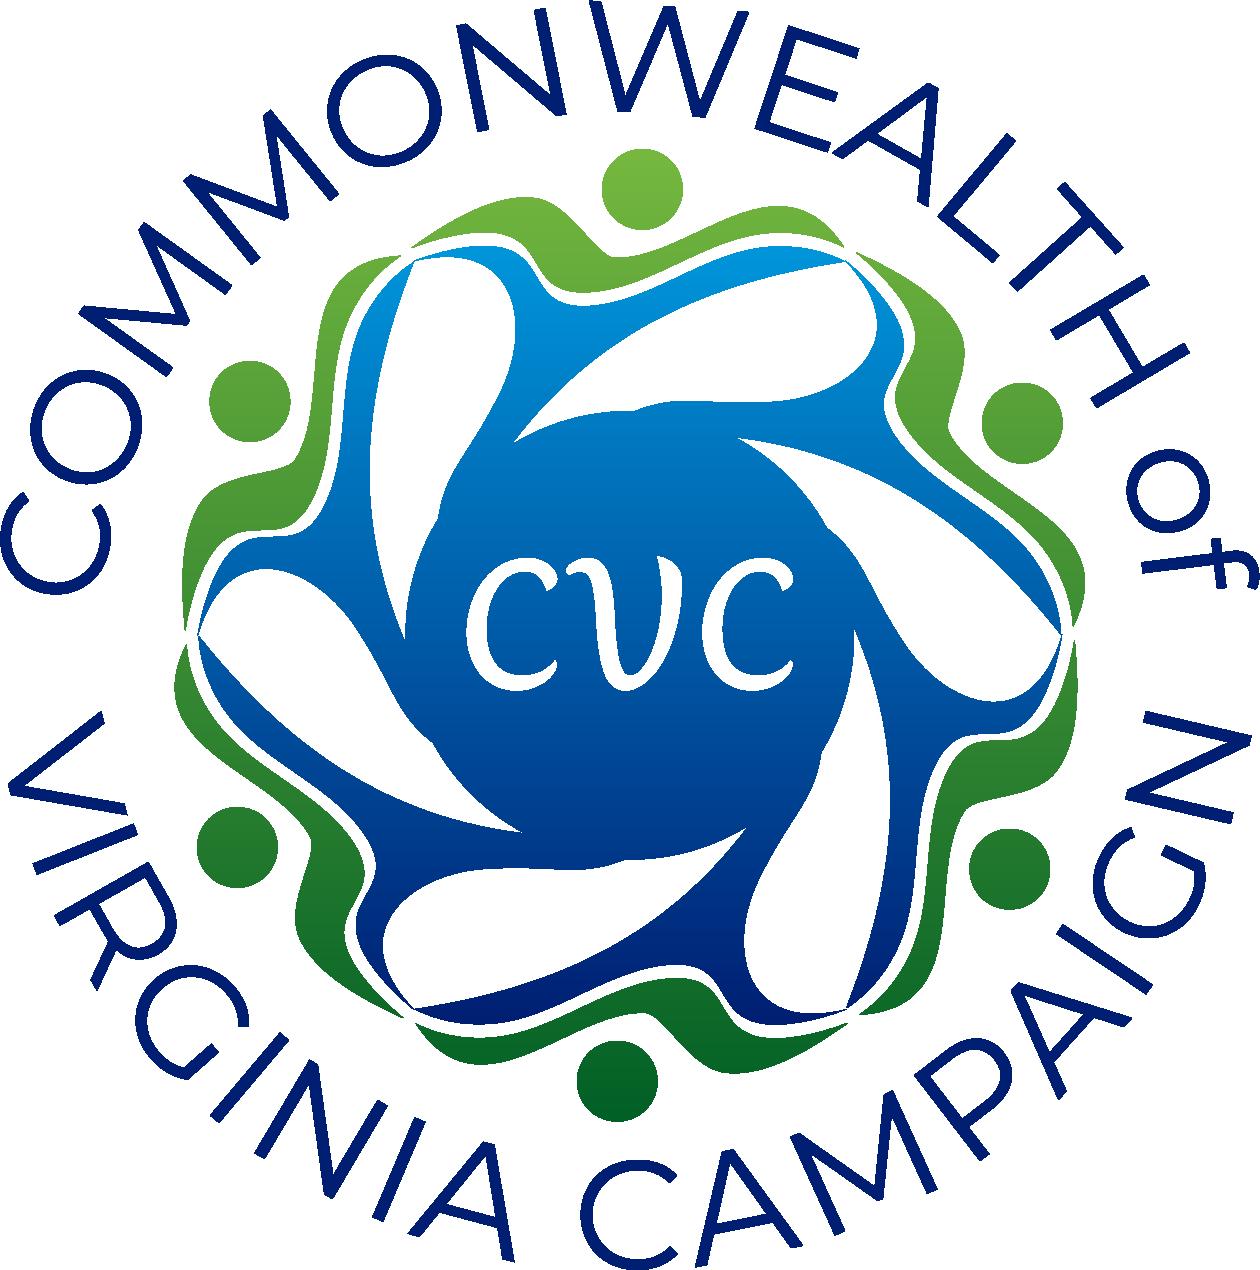 Commonwealth of Virginia Campaign logo